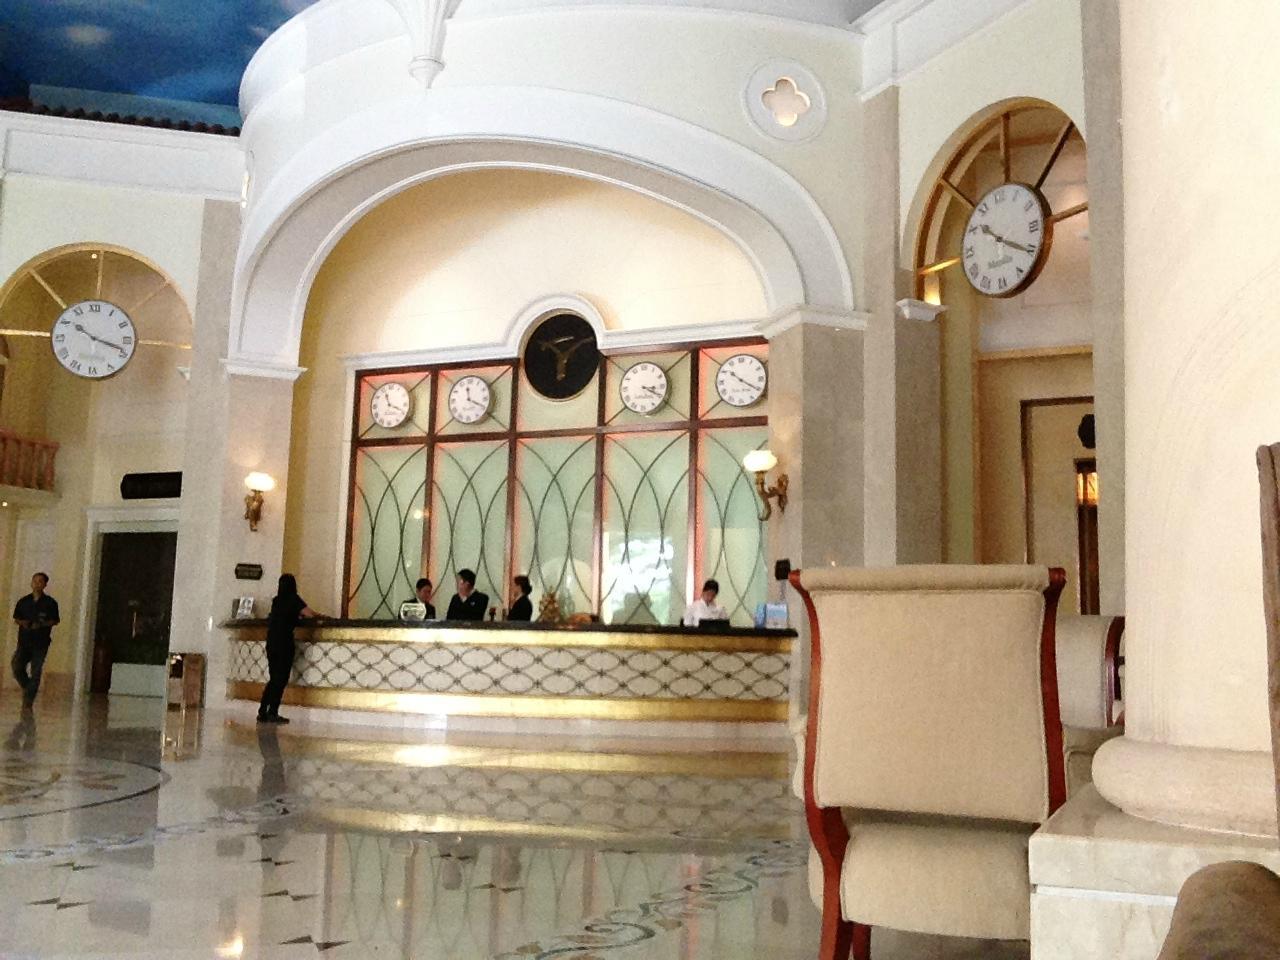 Fontana casino address